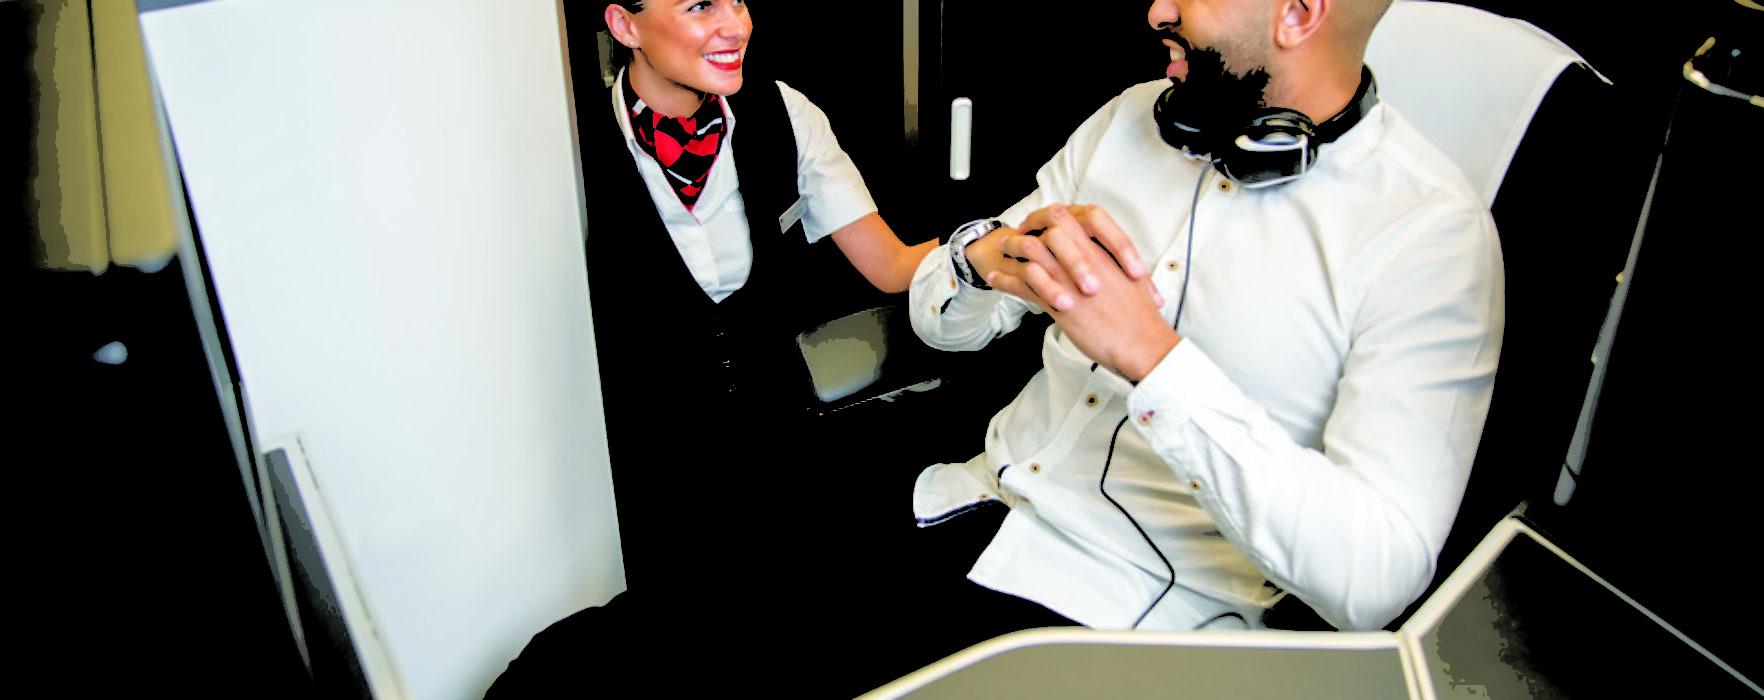 British Airways unveils new business class 'Club-Suites'